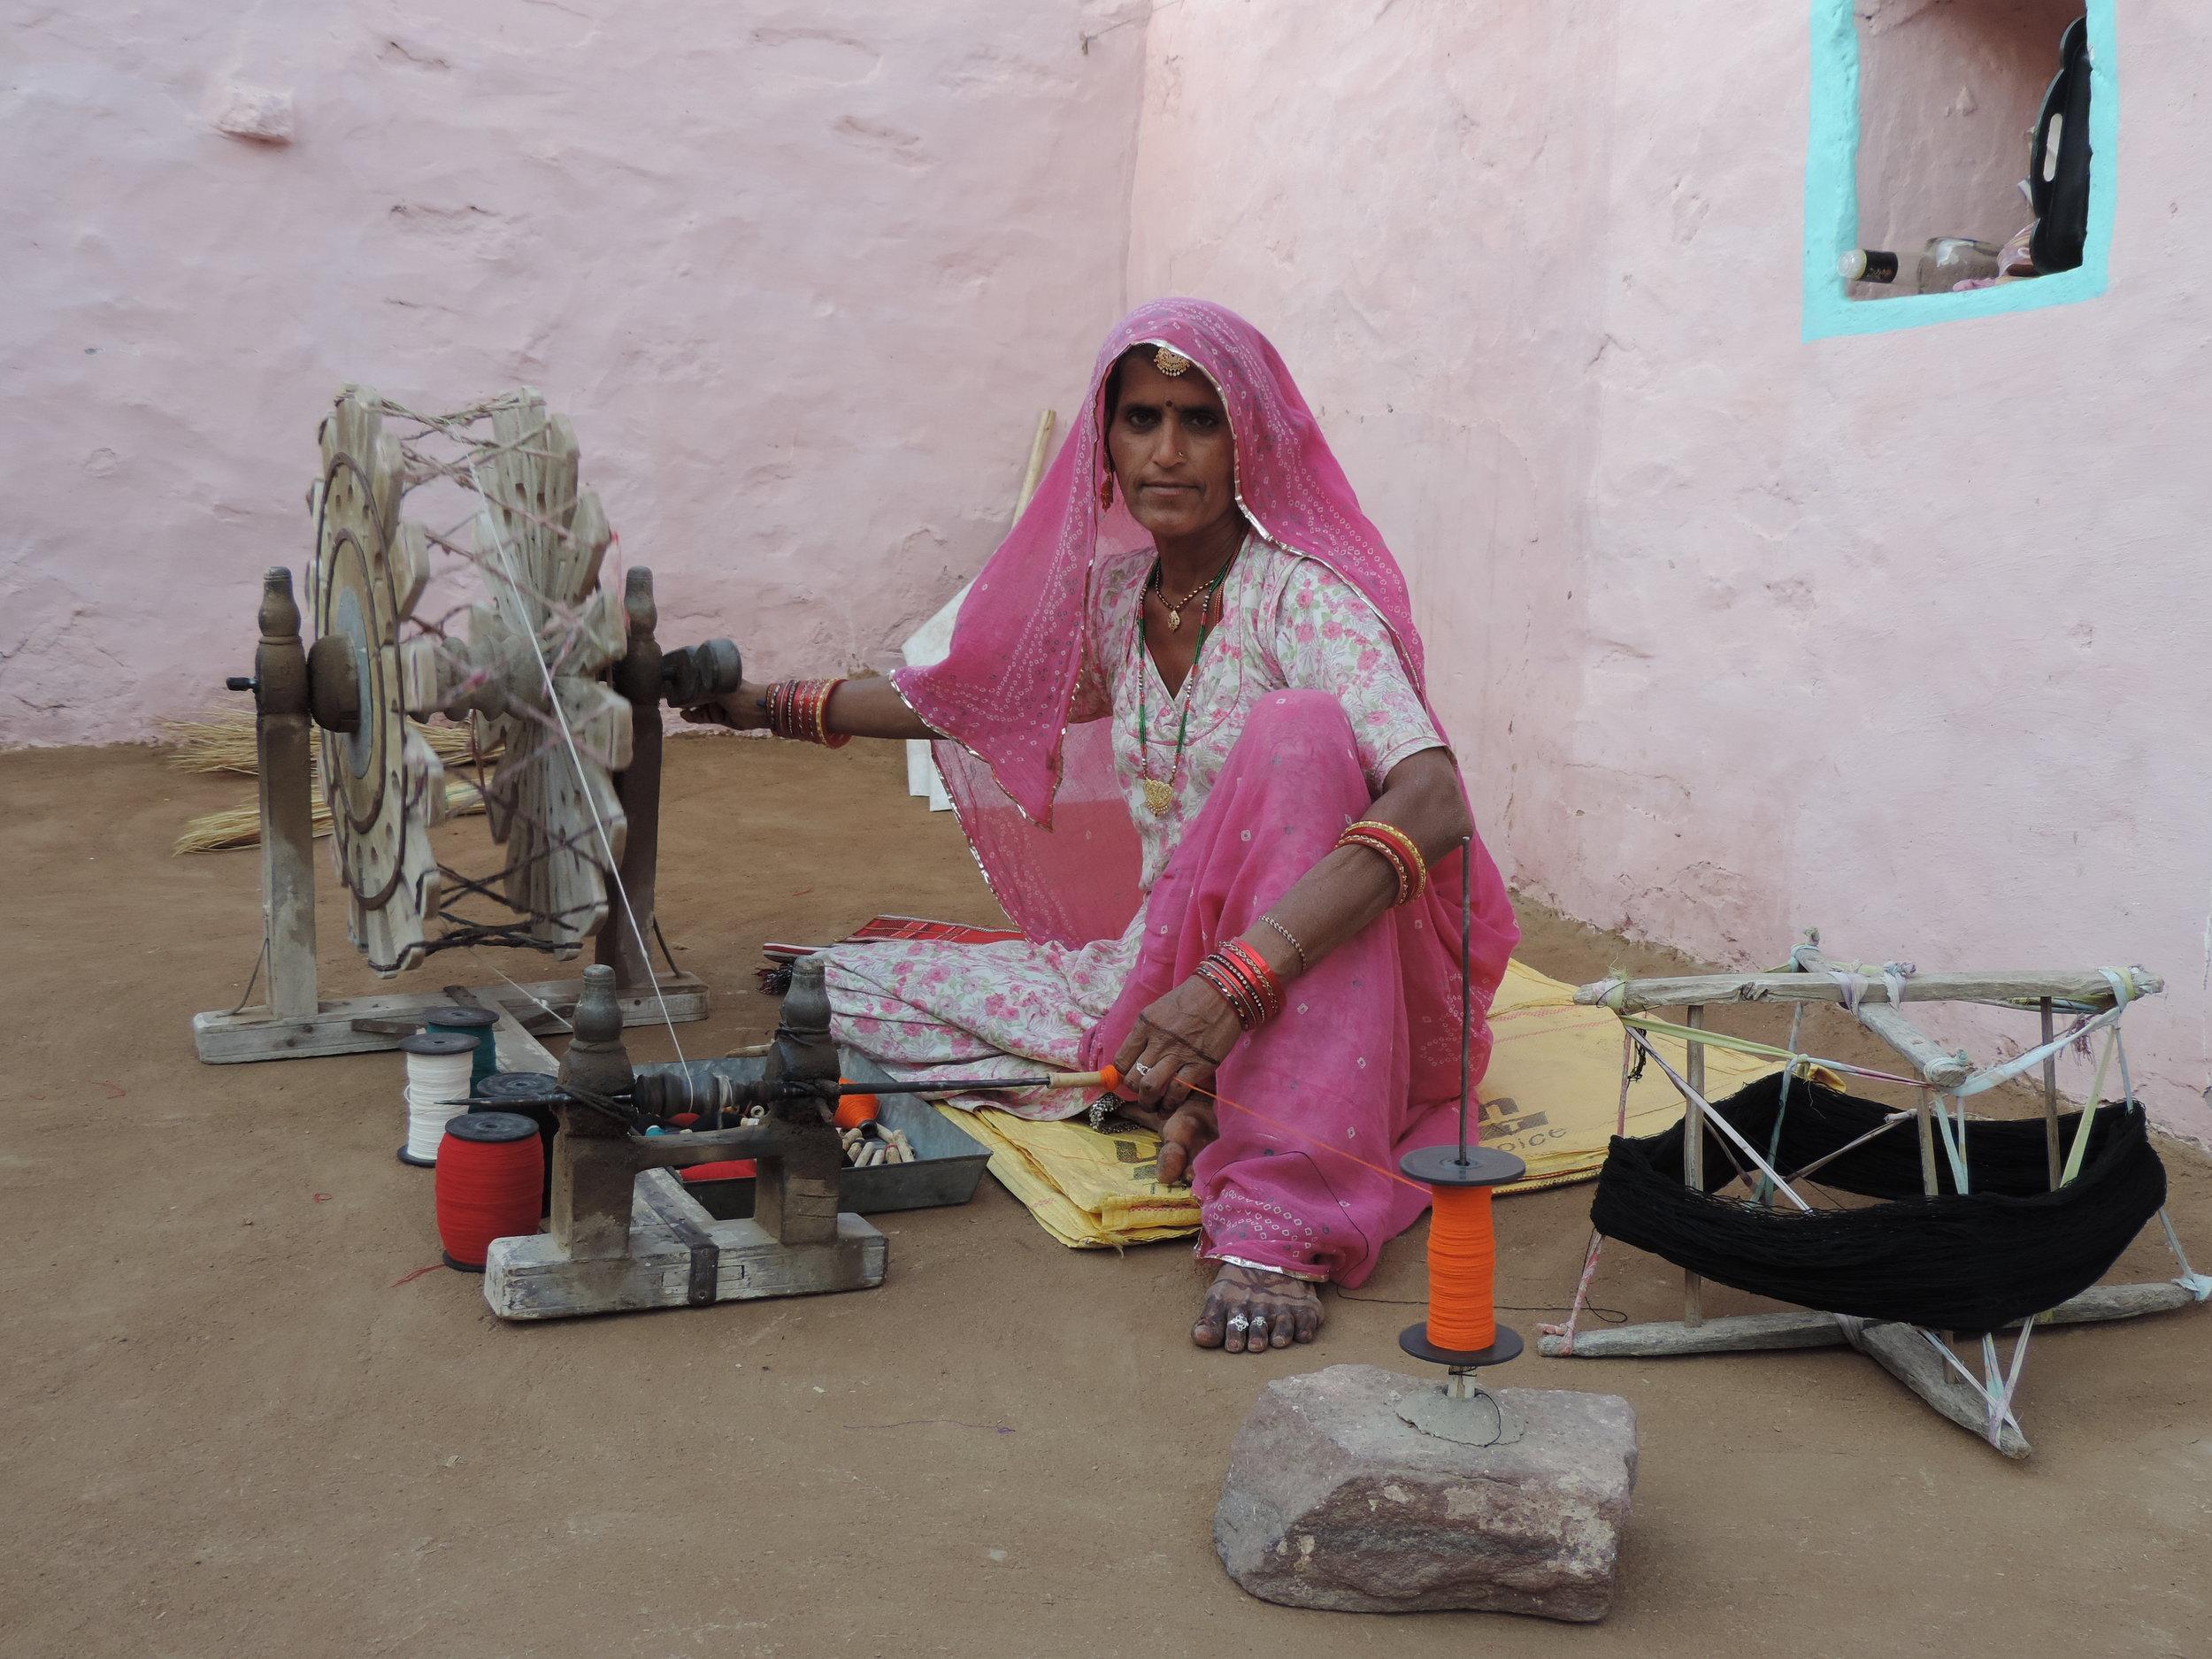 Nijra spinning yarn using a traditional Charkha